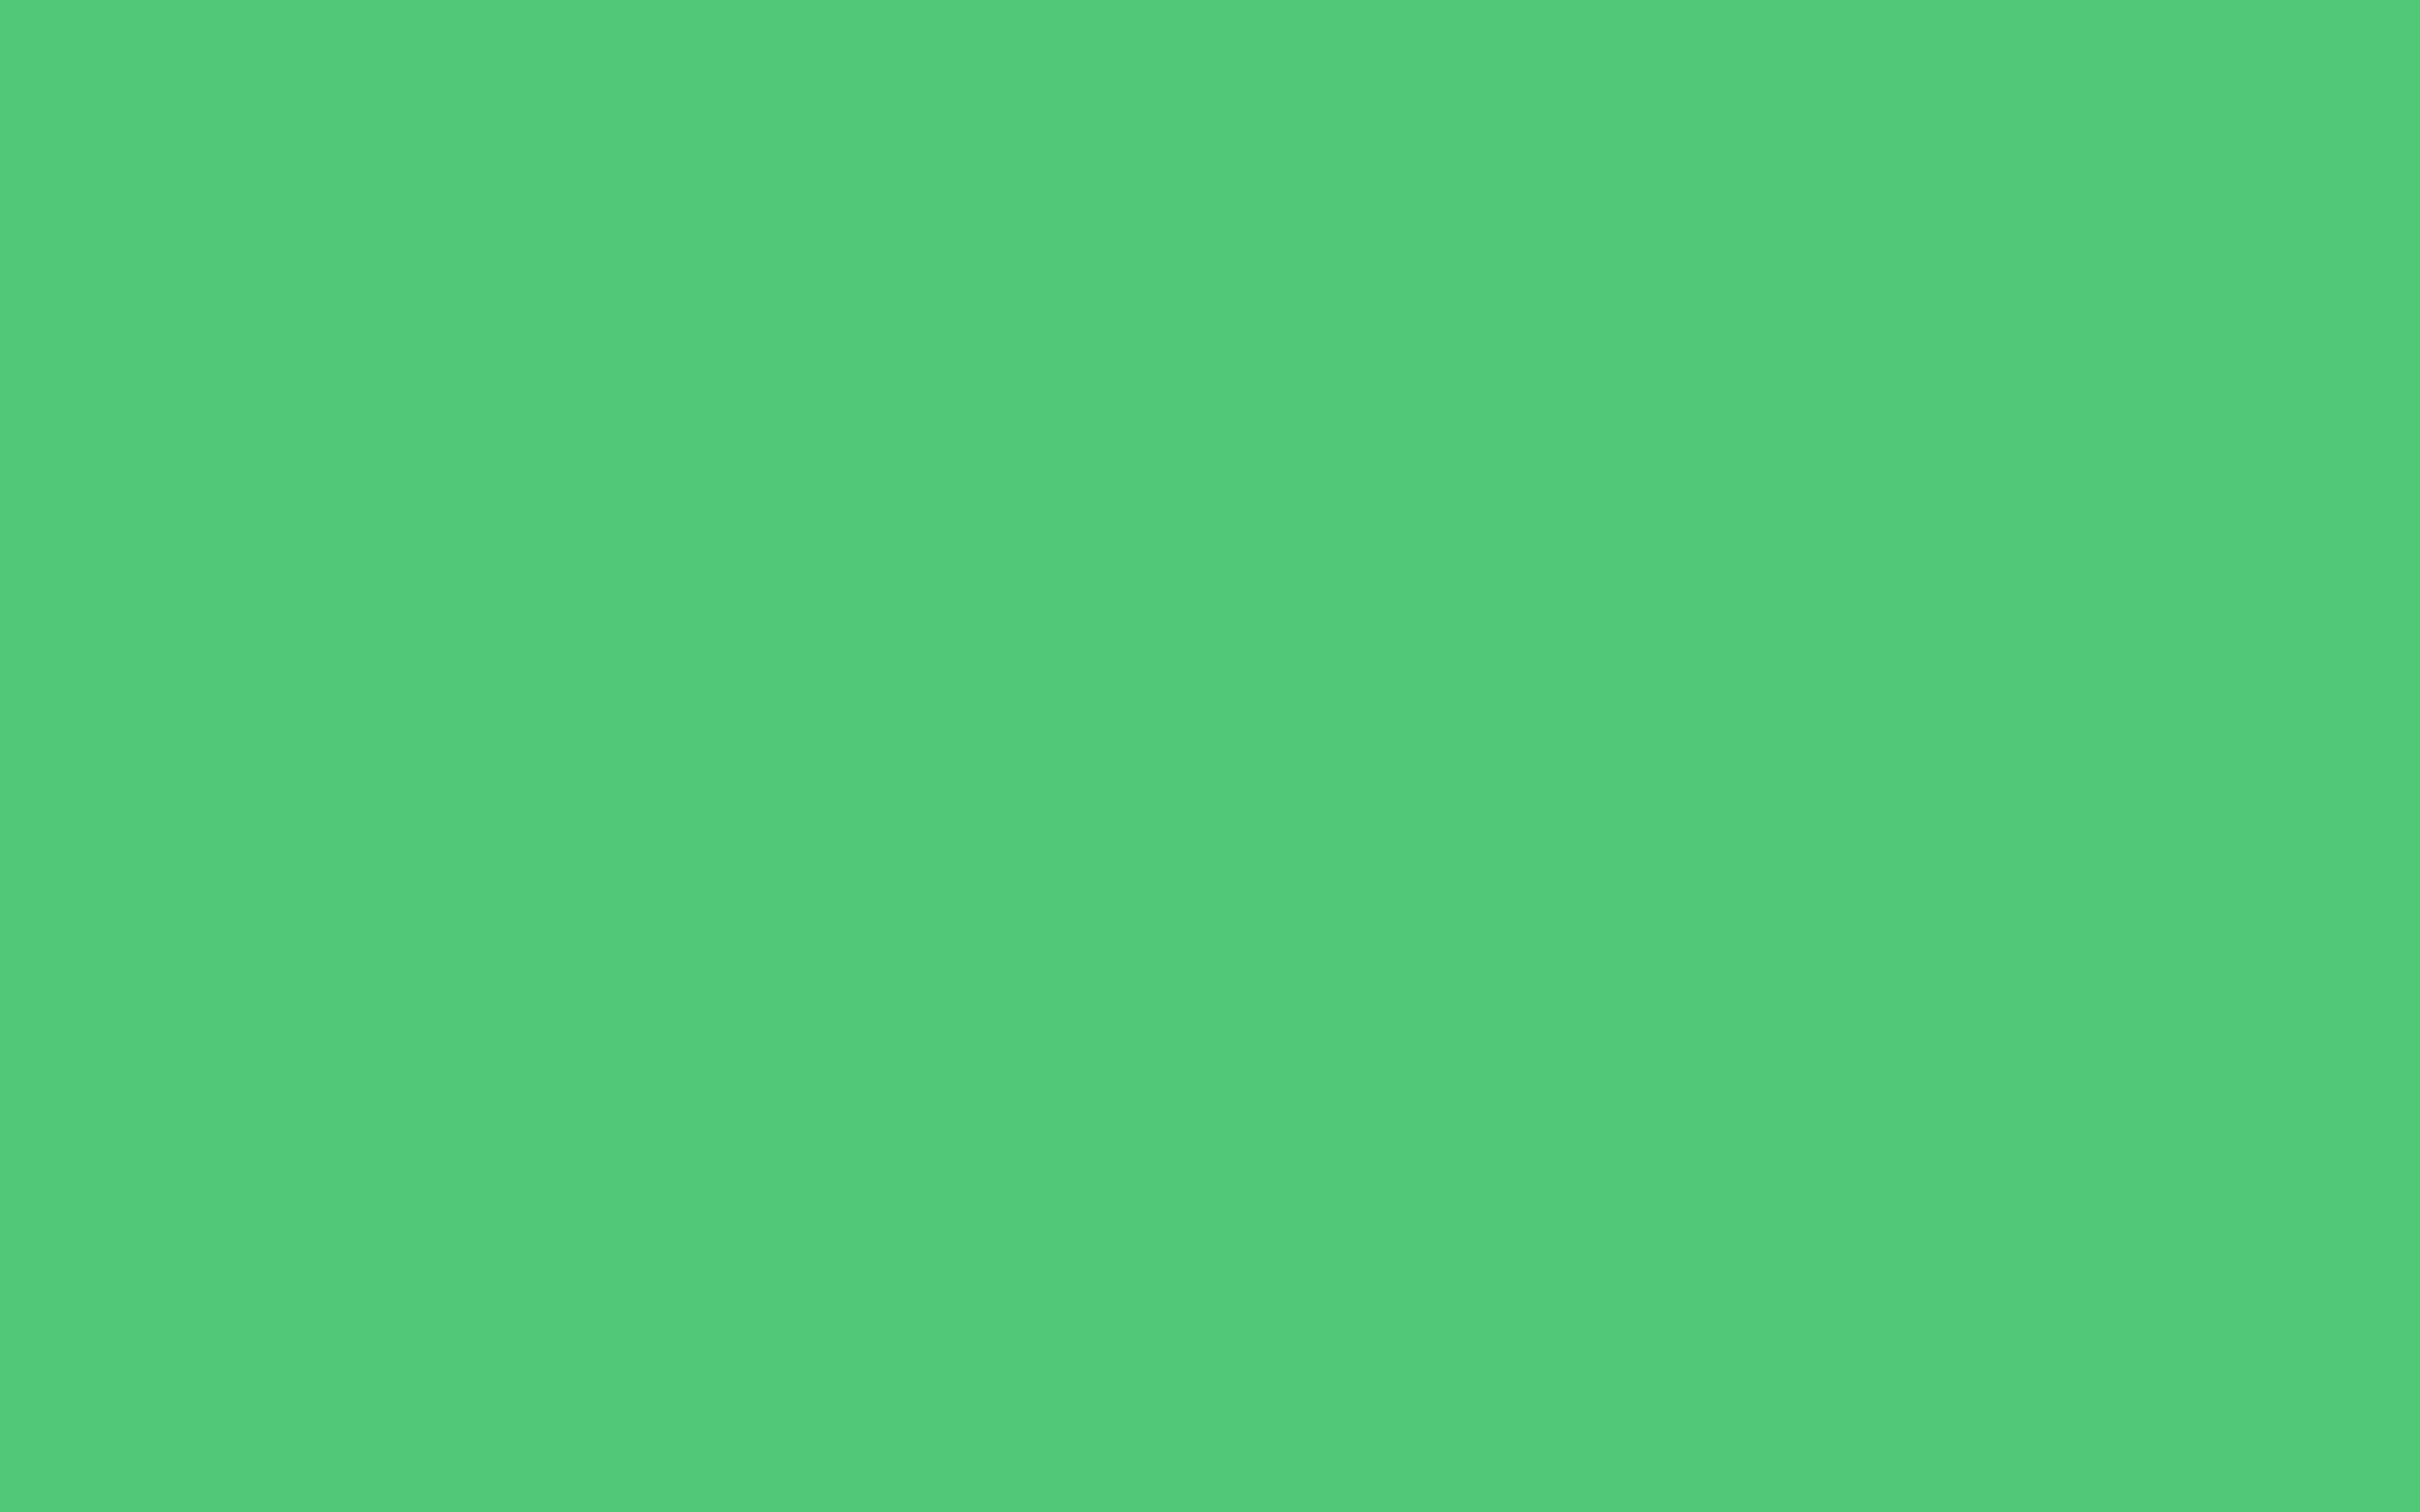 2560x1600 Paris Green Solid Color Background